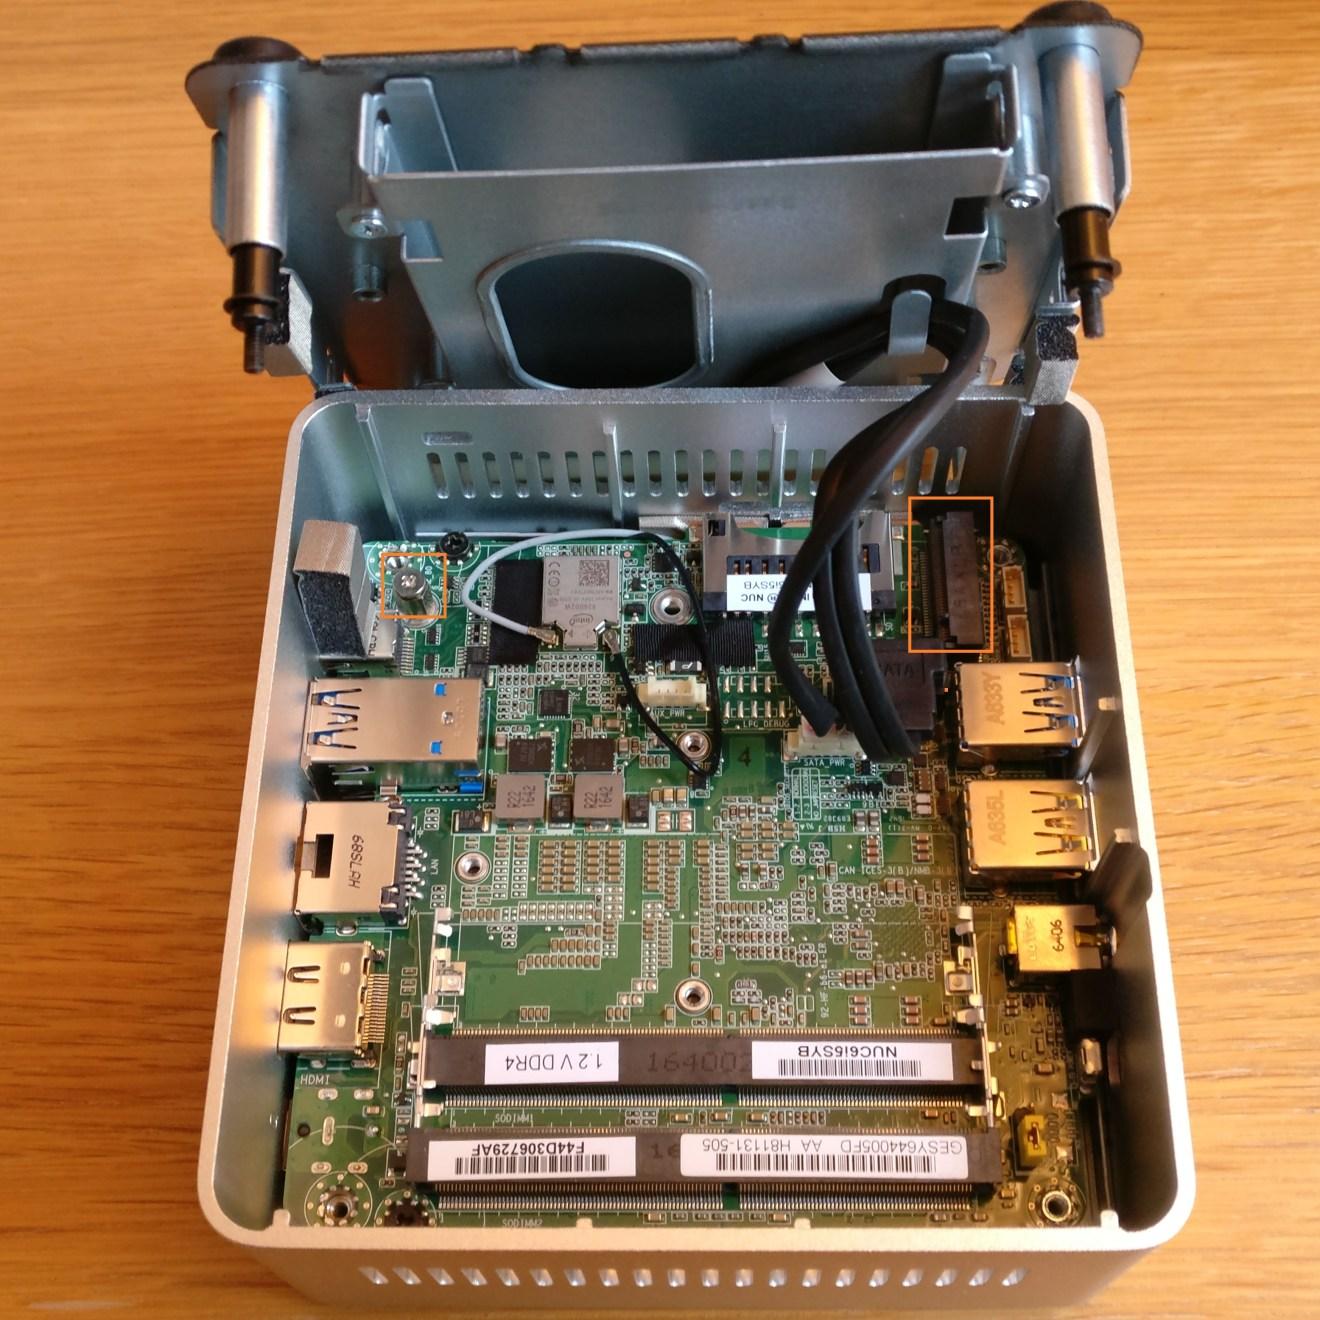 domalab.com intel nuc home lab Intel NUC kit